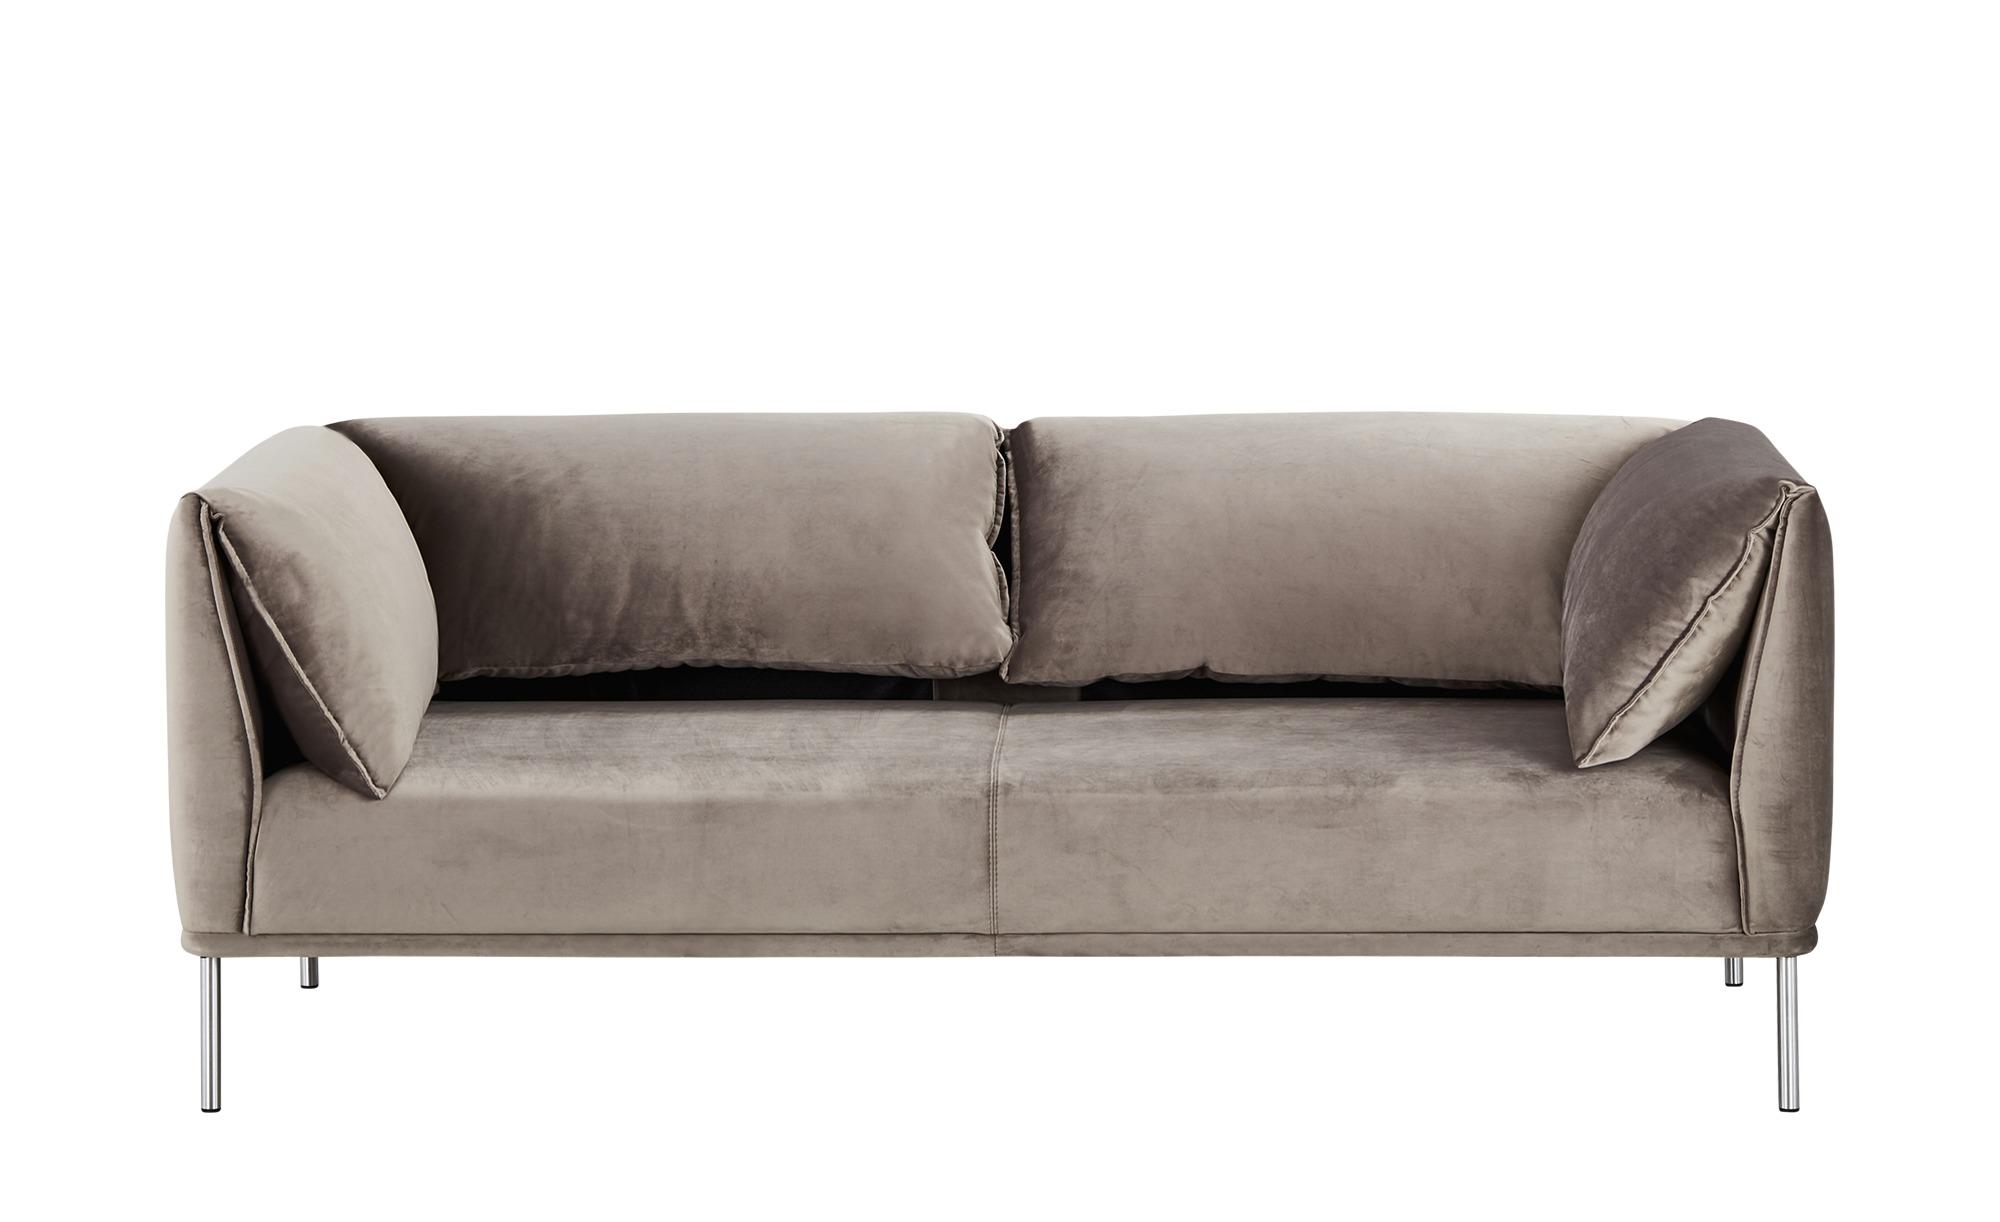 Sofa grau - Flachgewebe Melania ¦ grau ¦ Maße (cm): B: 206 H: 76 T: 89 Polstermöbel > Sofas > Einzelsofas - Höffner